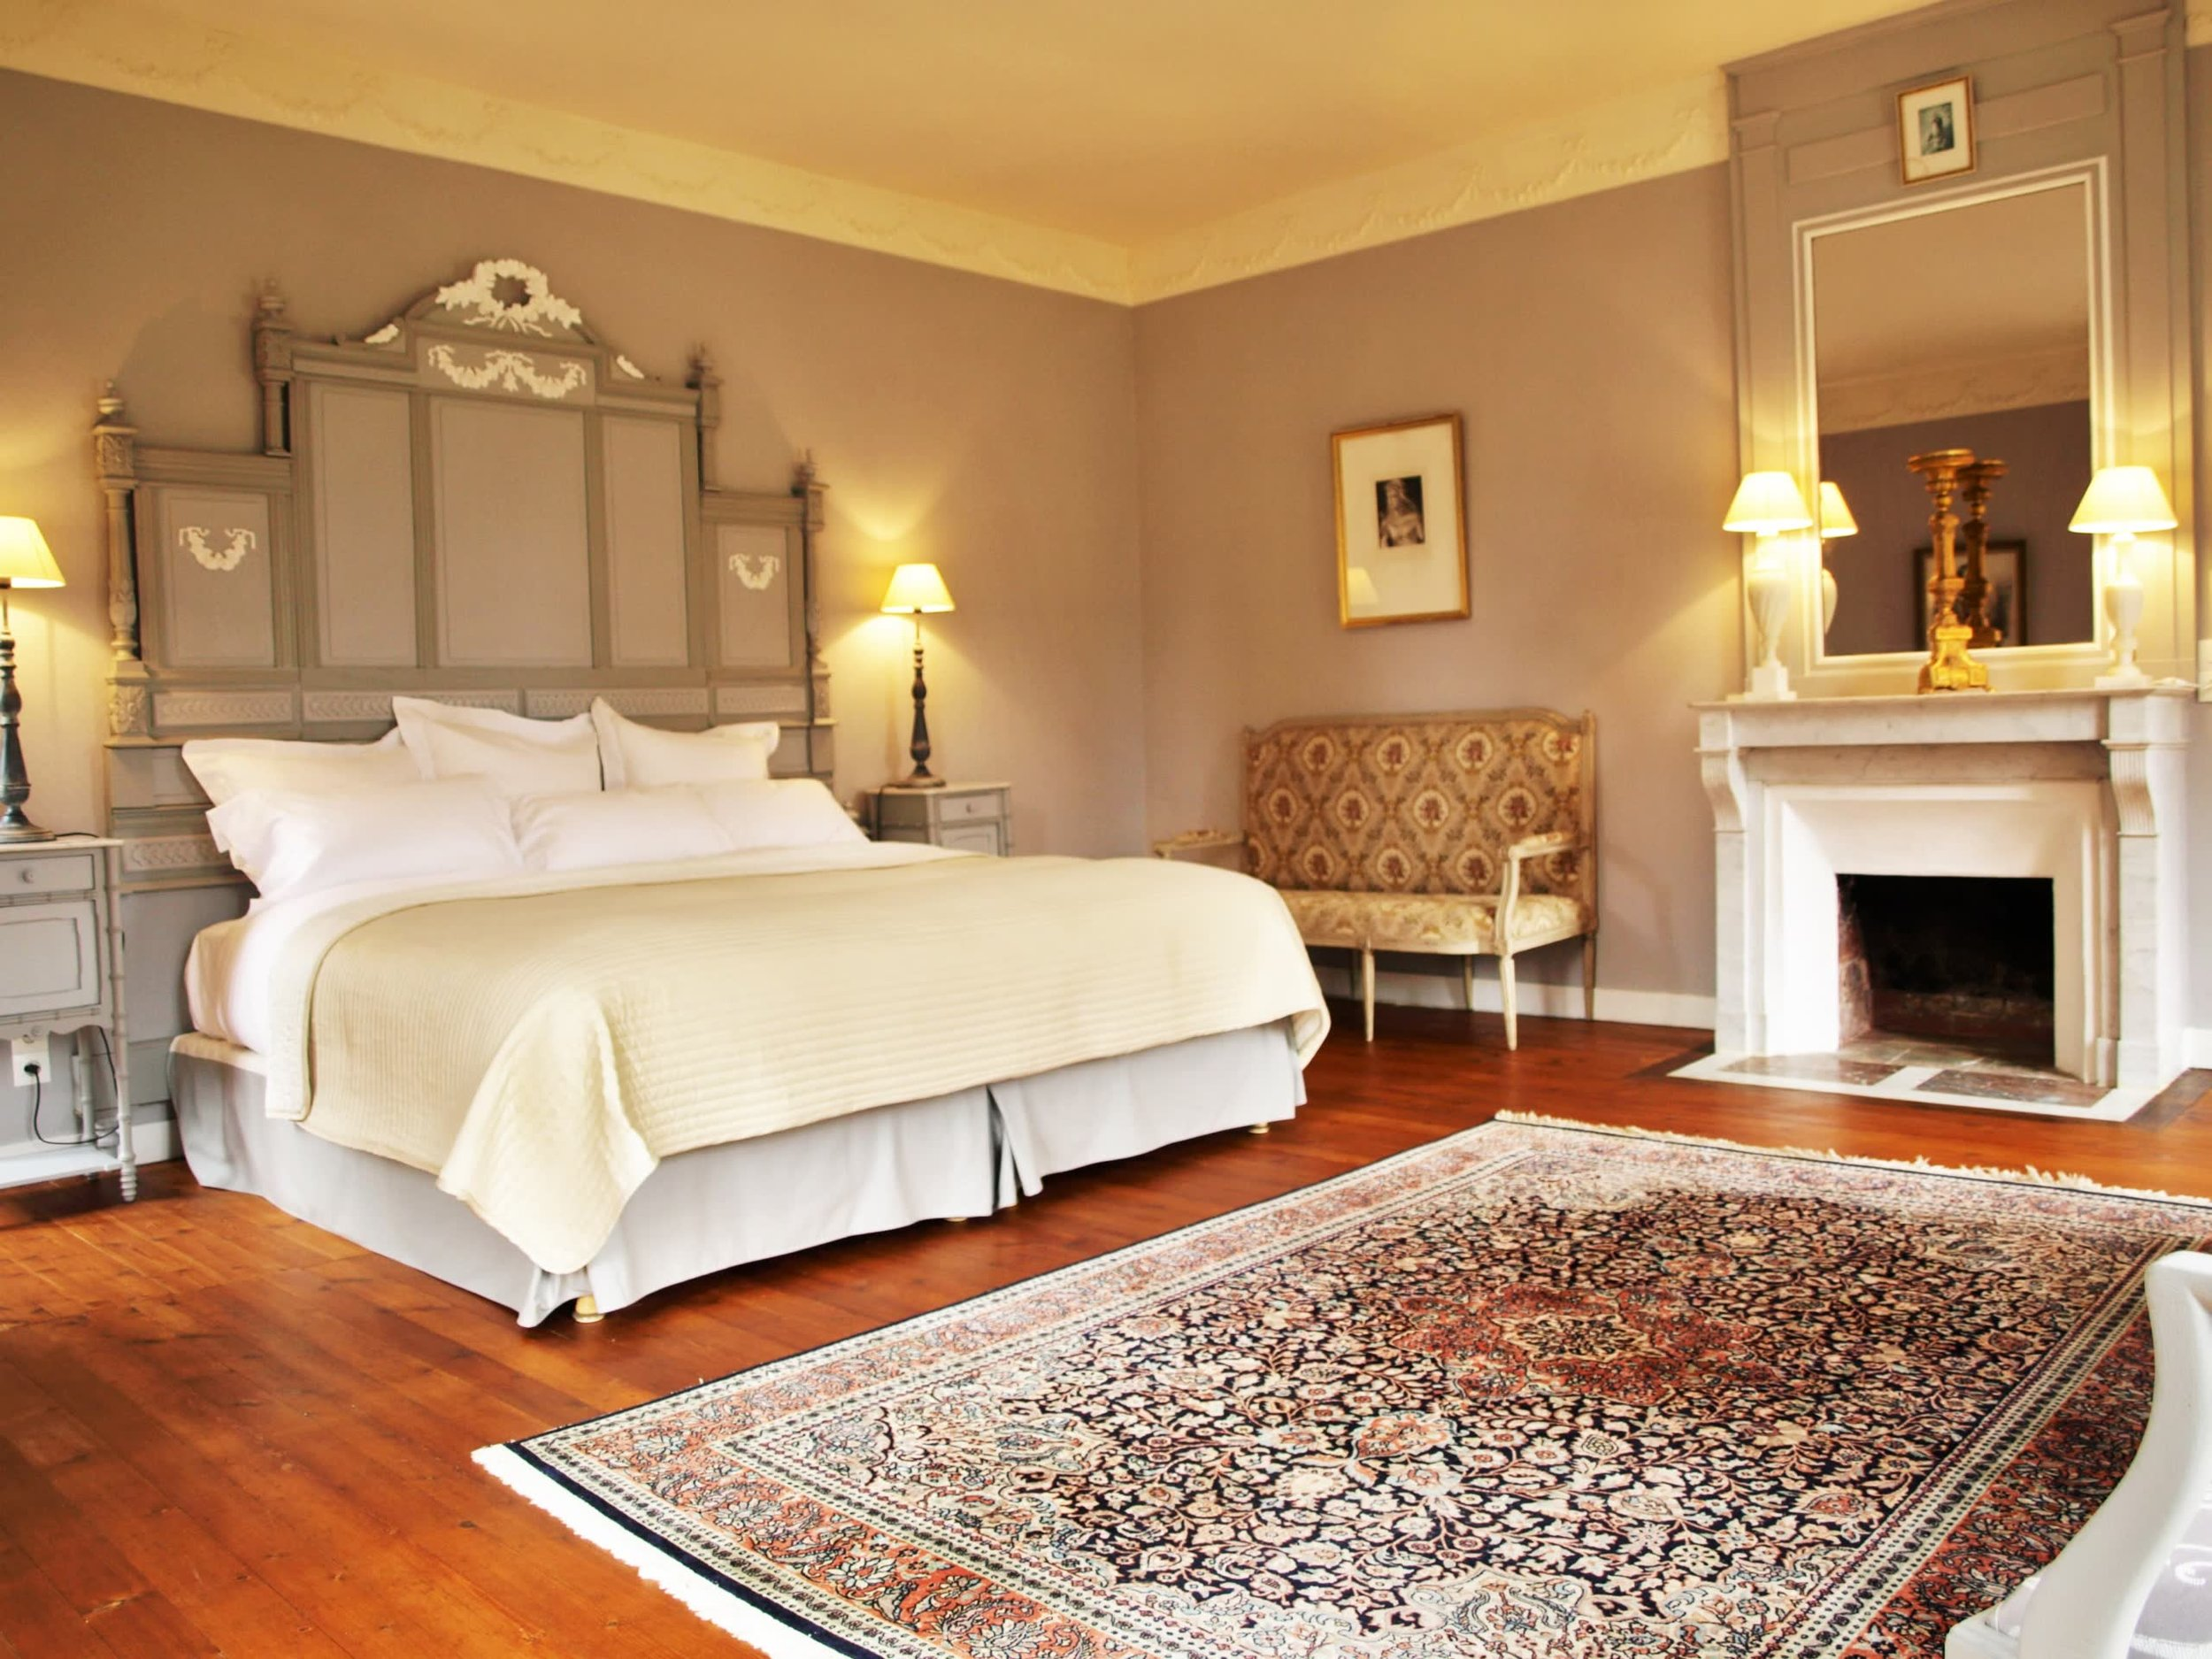 Chateau de la Pommeraye - charming boutique hotel chateau b&b spa normandy calvados bedroom Rubans 5(2).jpg